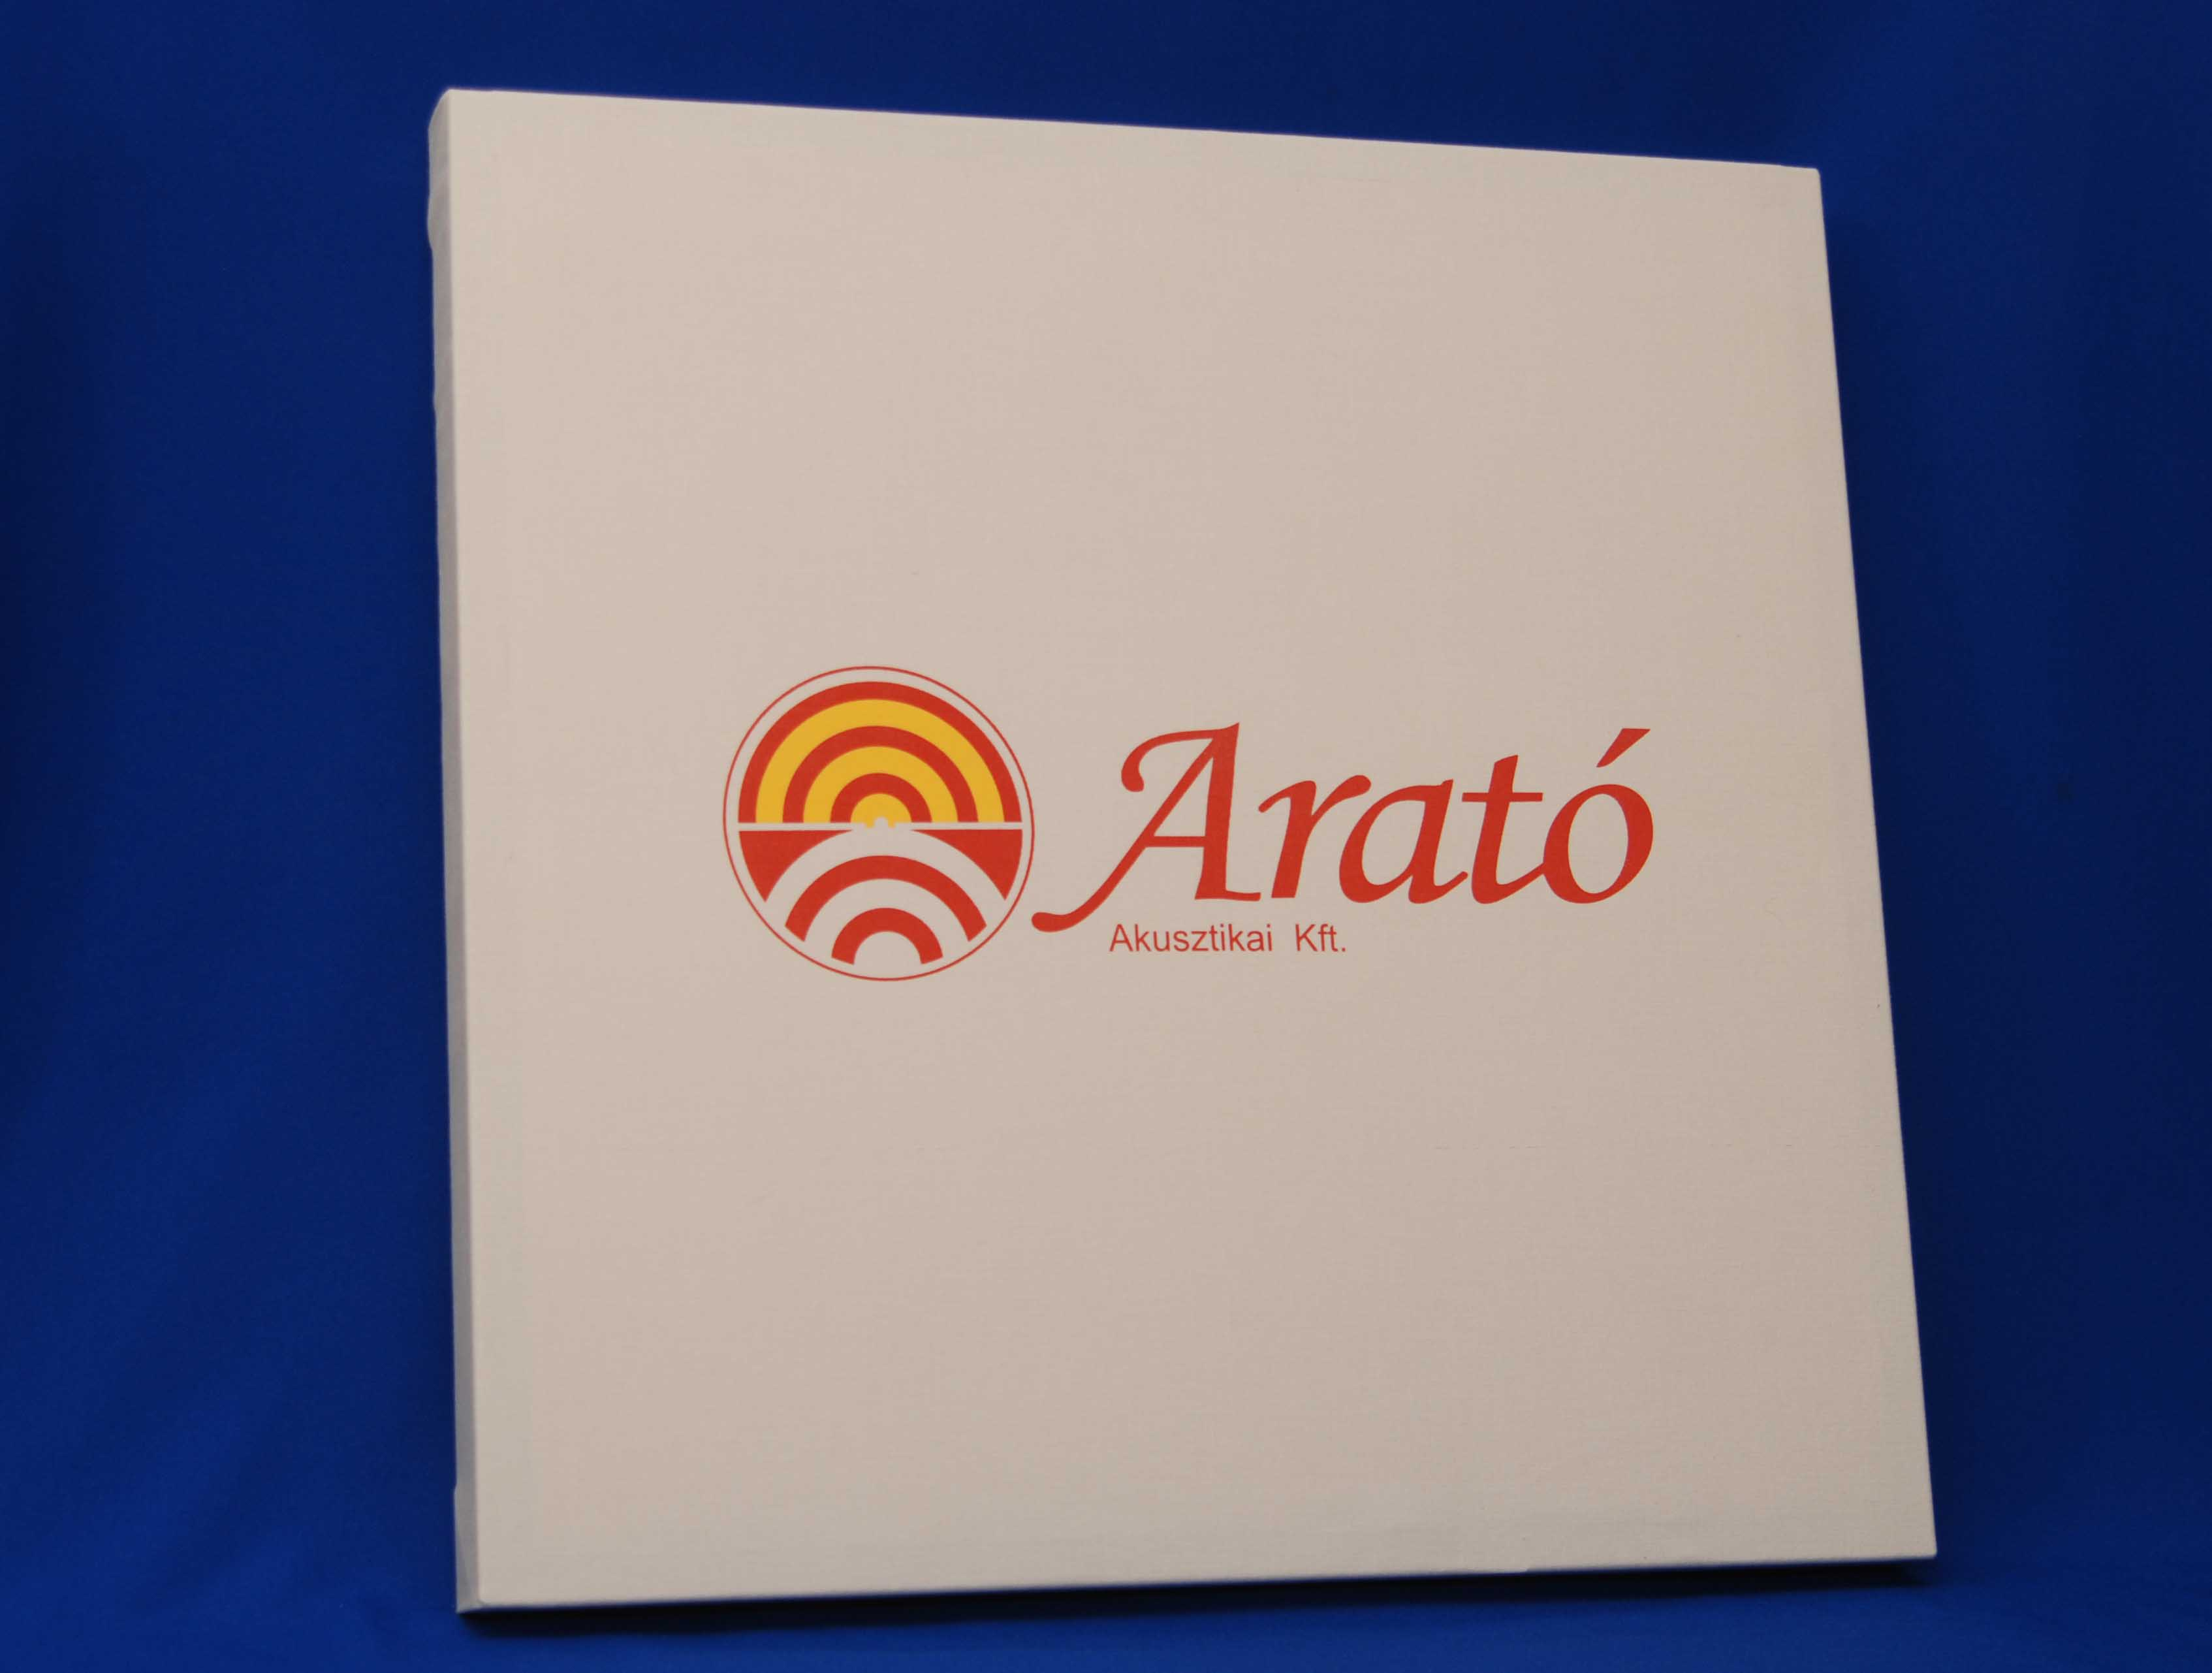 Arato_panel_logo_small